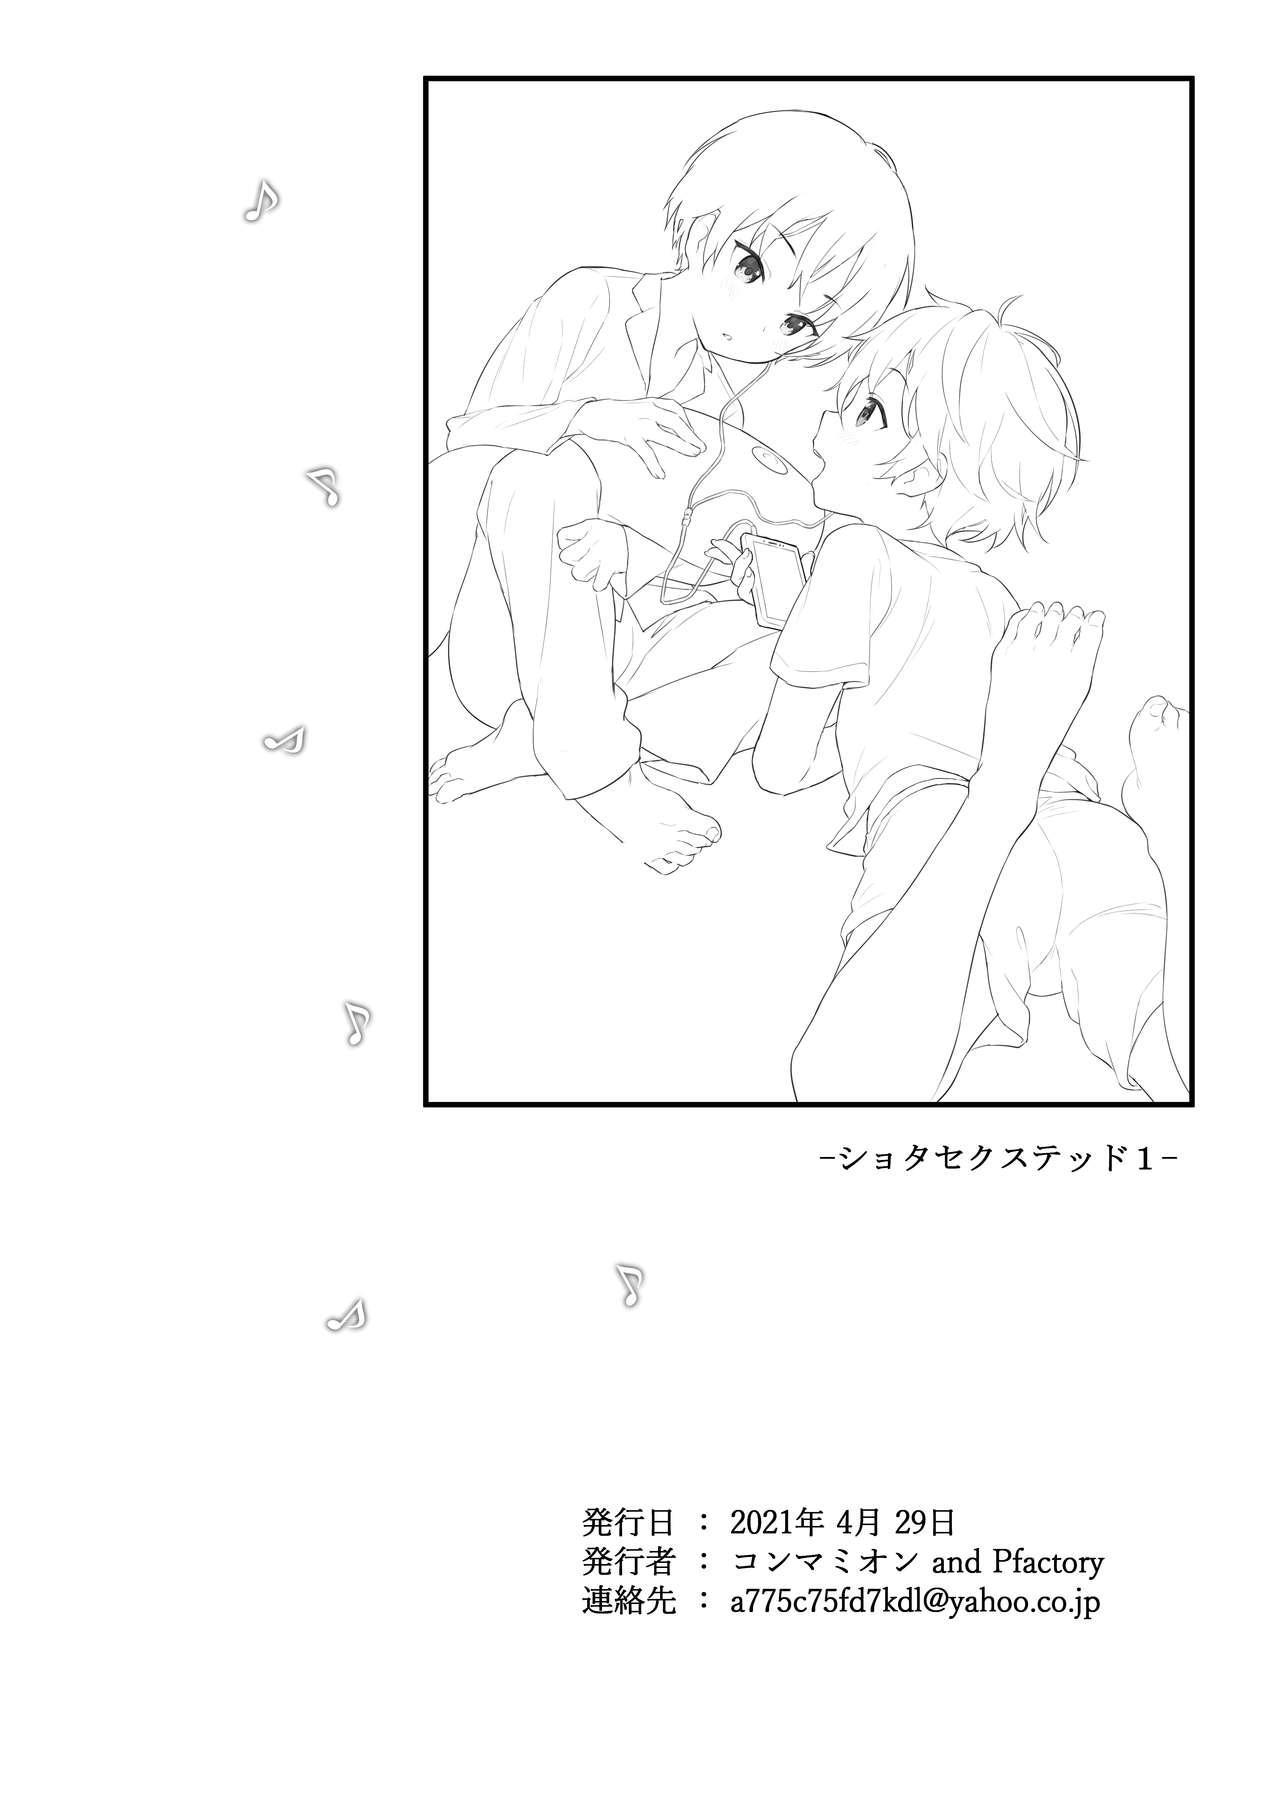 Shota Sextet Vol. 1 66